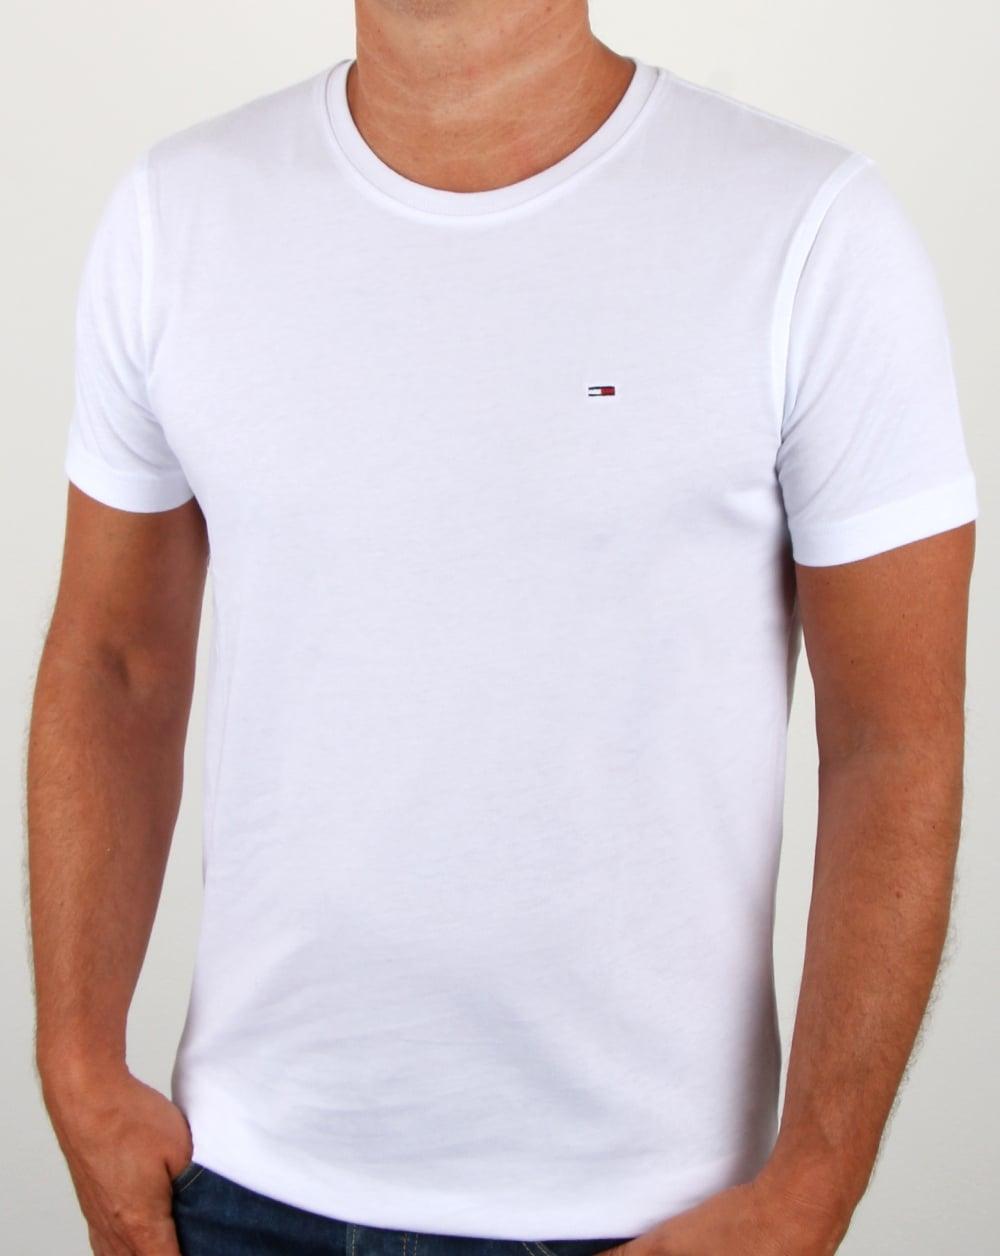 d911dba6 Tommy Hilfiger Cotton Crew Neck T Shirt White | 80s casual classics